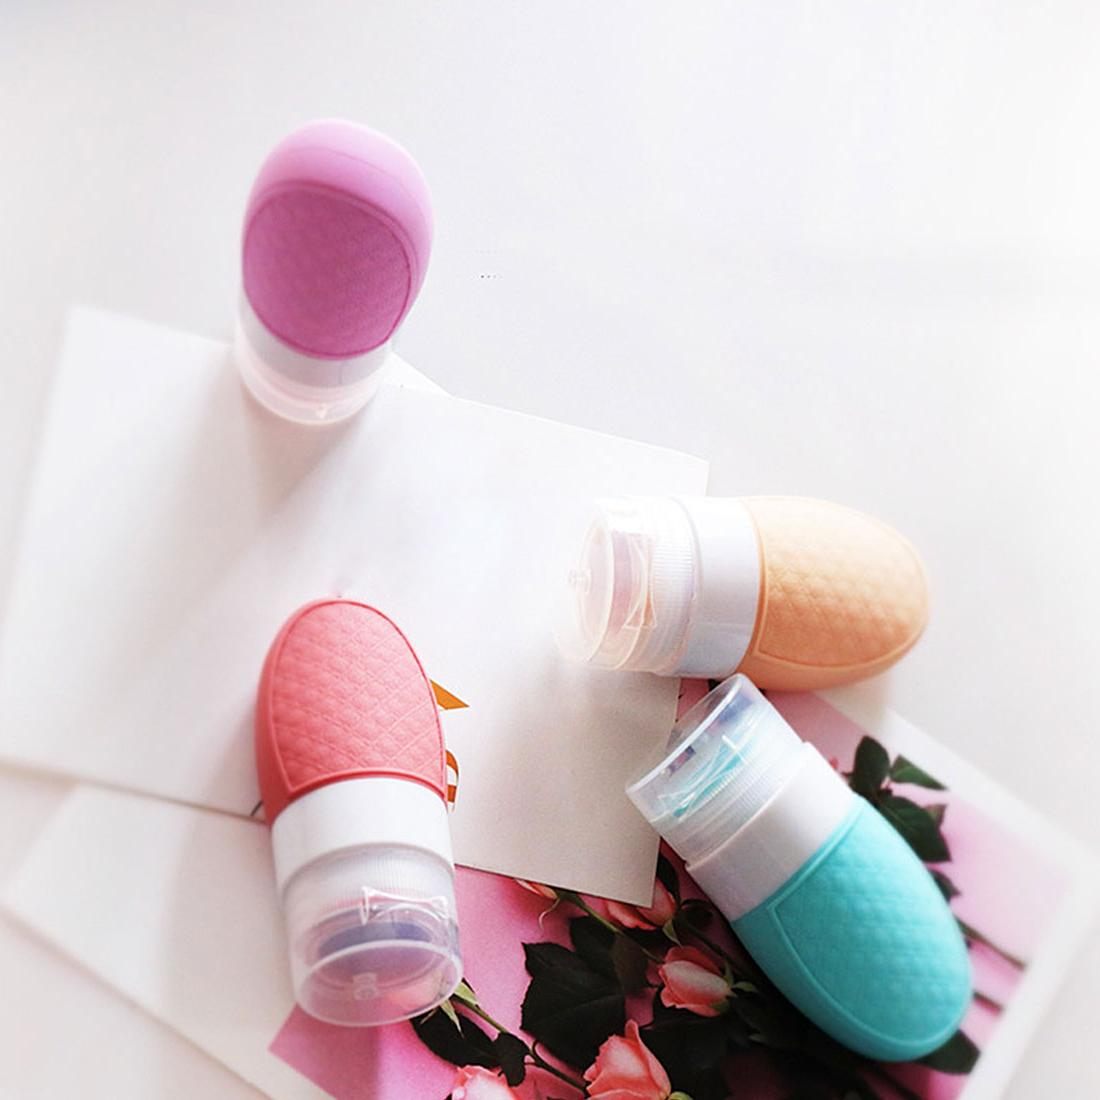 Travel portable cosmetic <font><b>soap</b></font> bottle lotion emulsion bottle